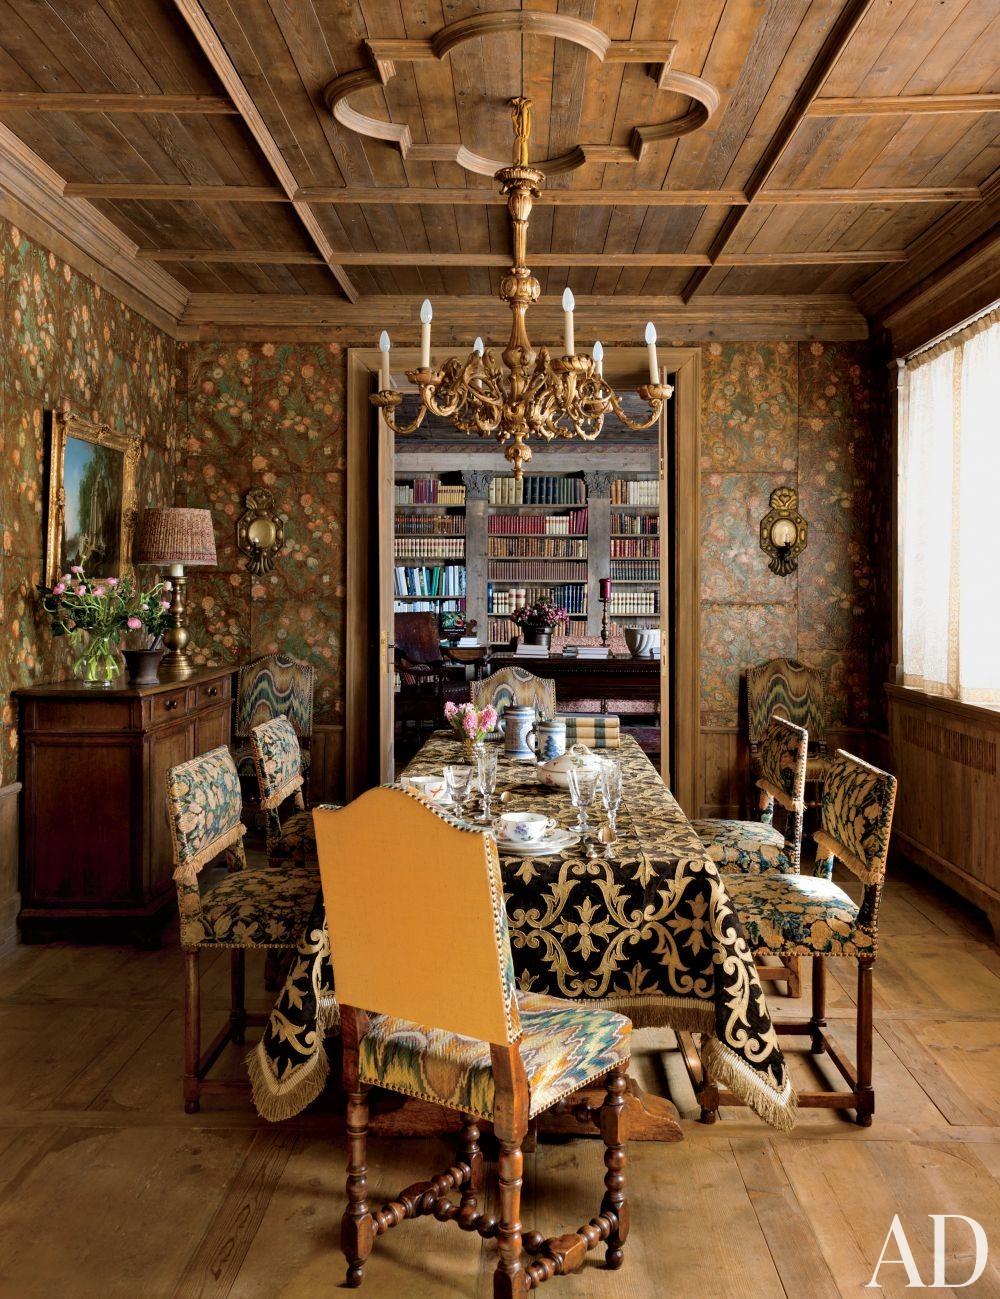 Rustic Dining Room by Studio Peregalli in Saint Moritz, Switzerland